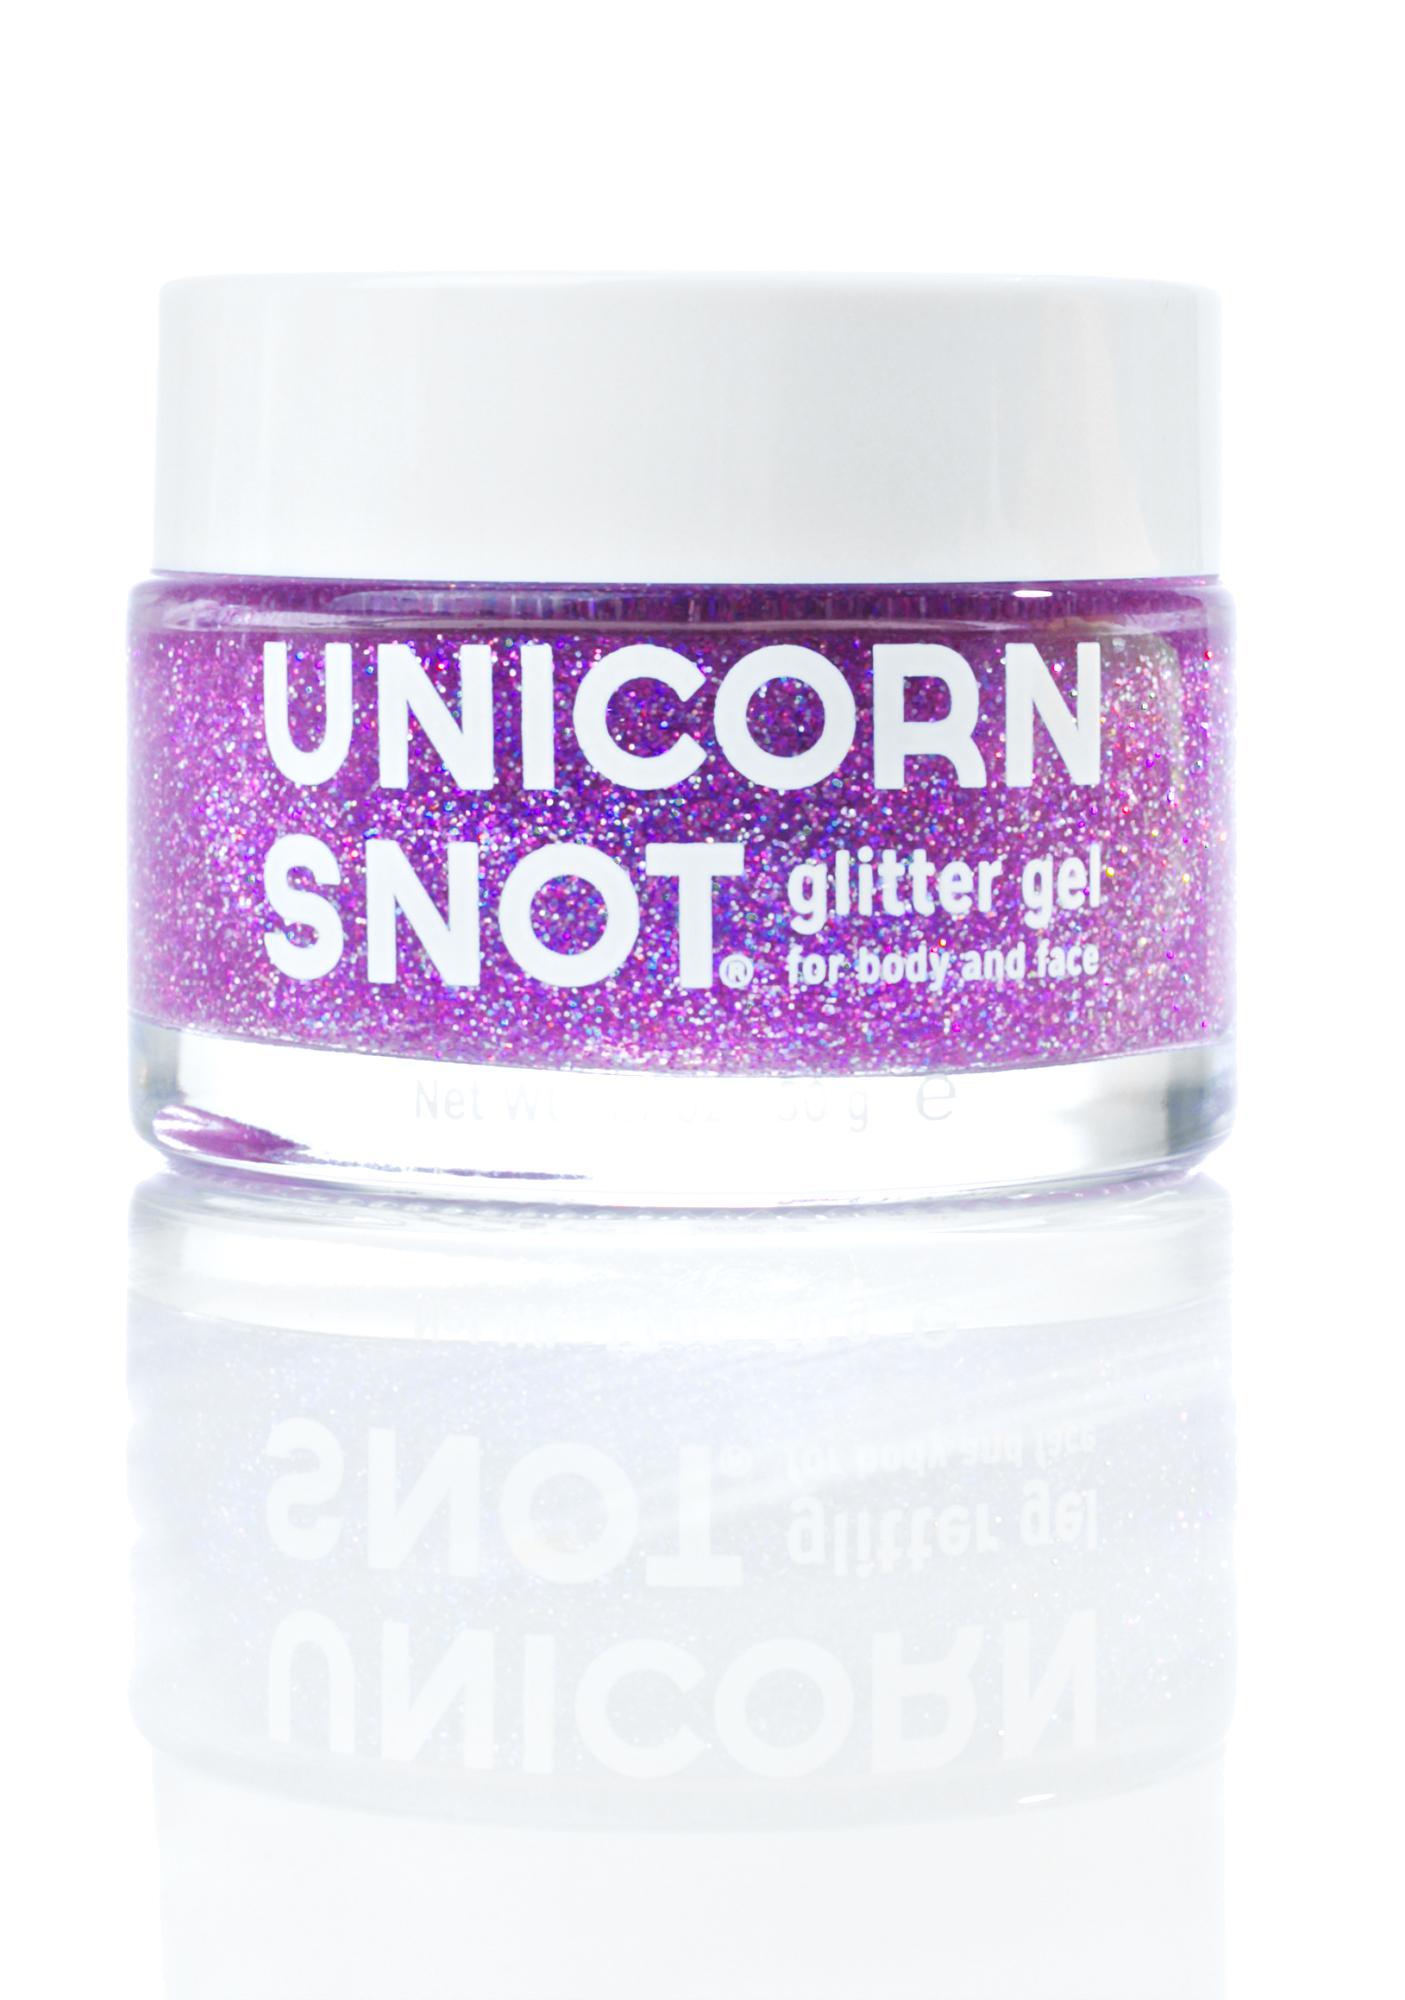 Unicorn Snot Purple Glitter Gel